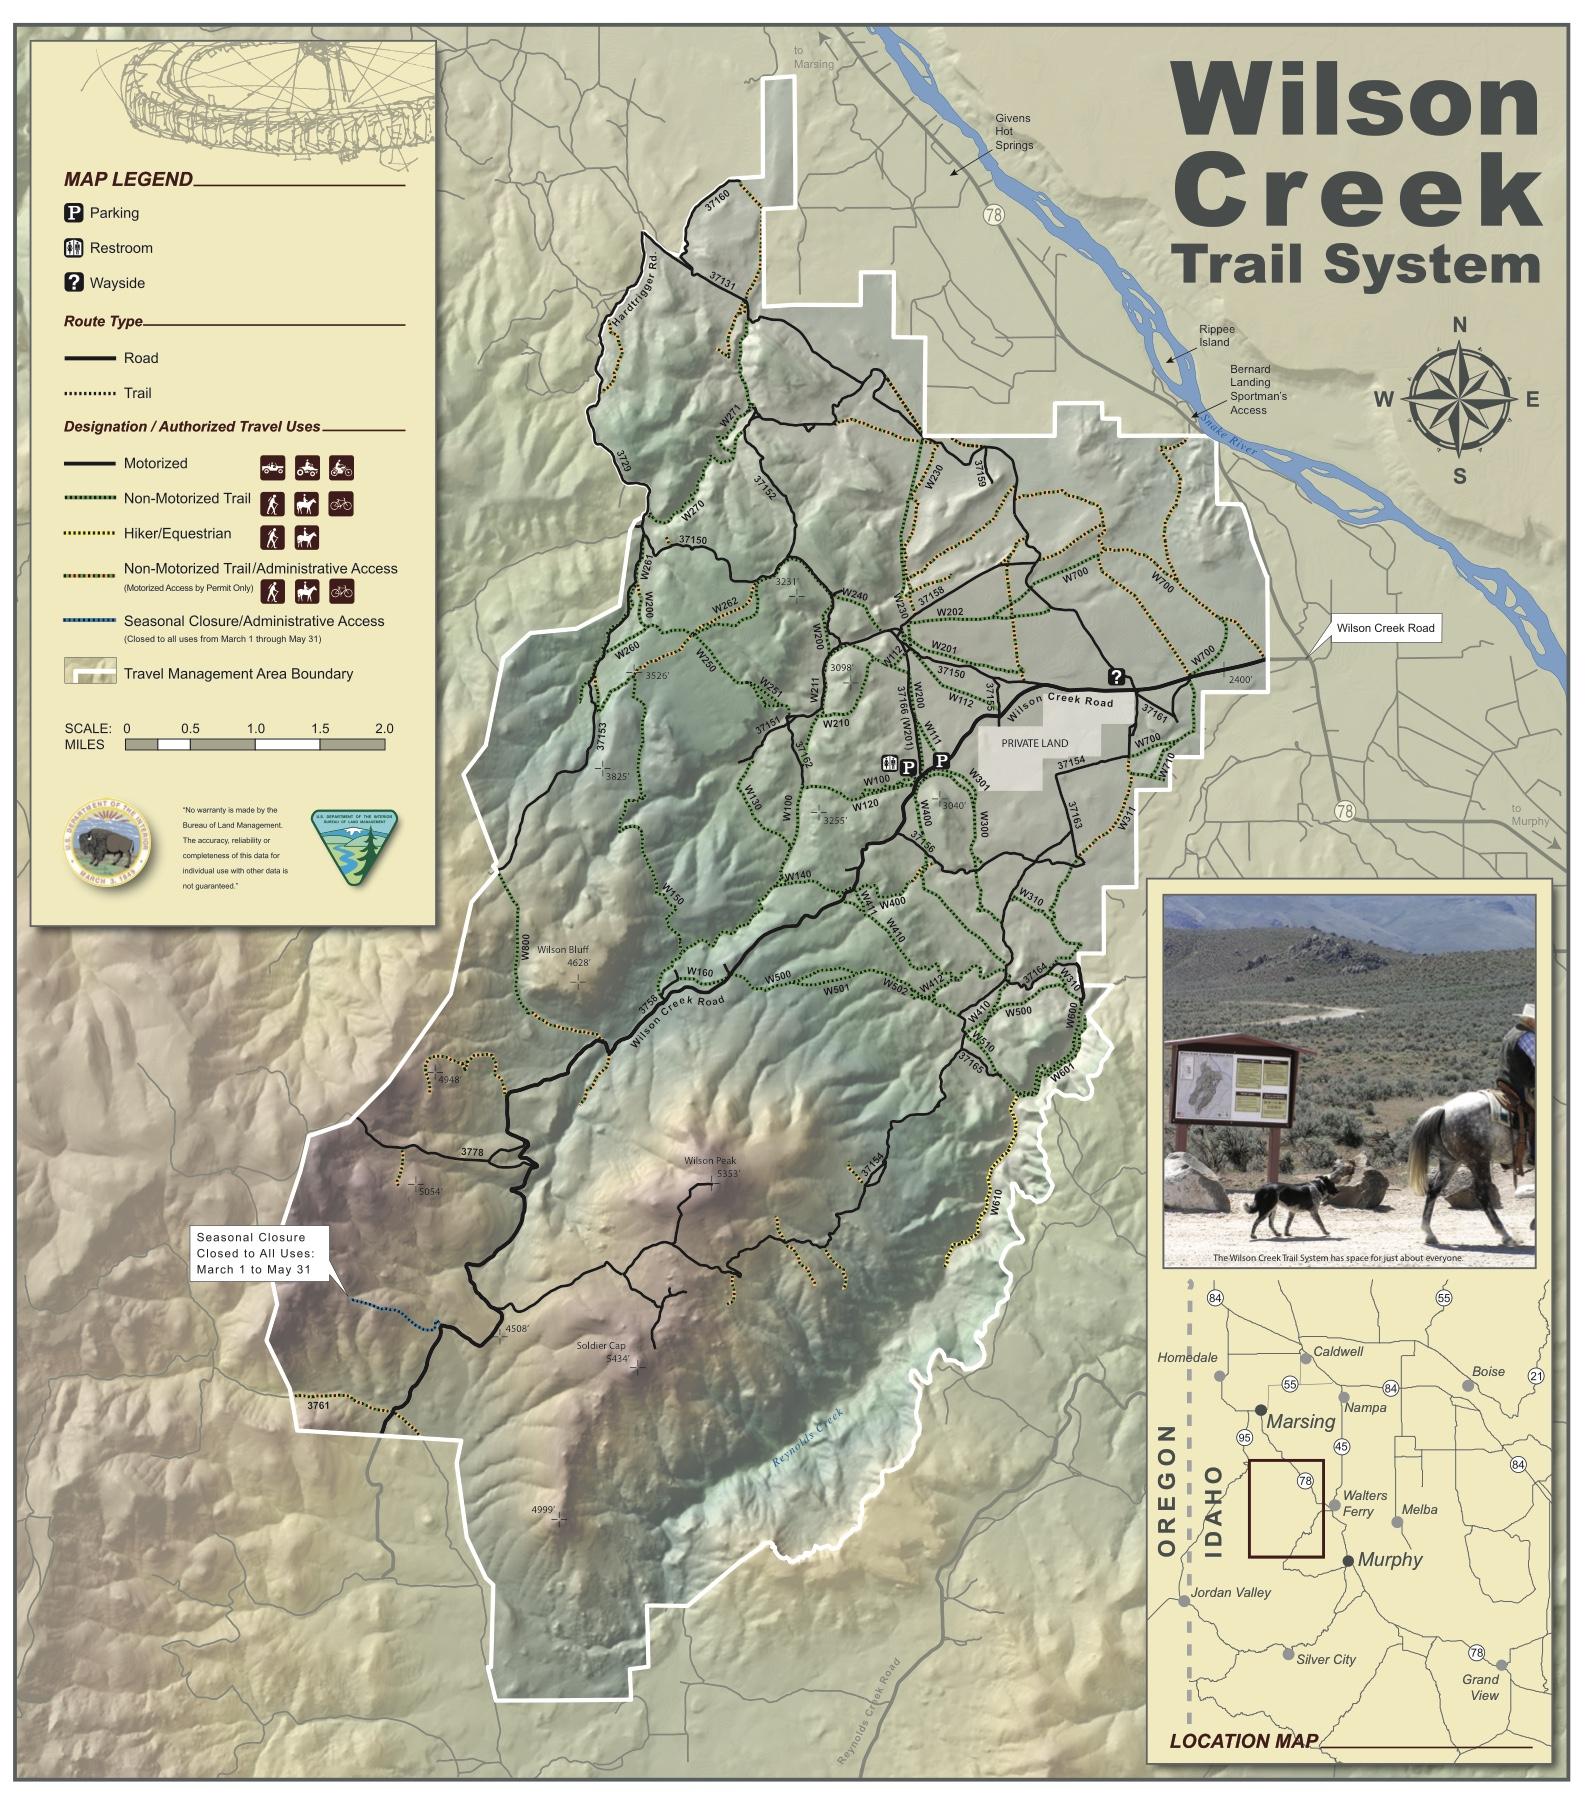 BLM Wilson Creek Trail System.